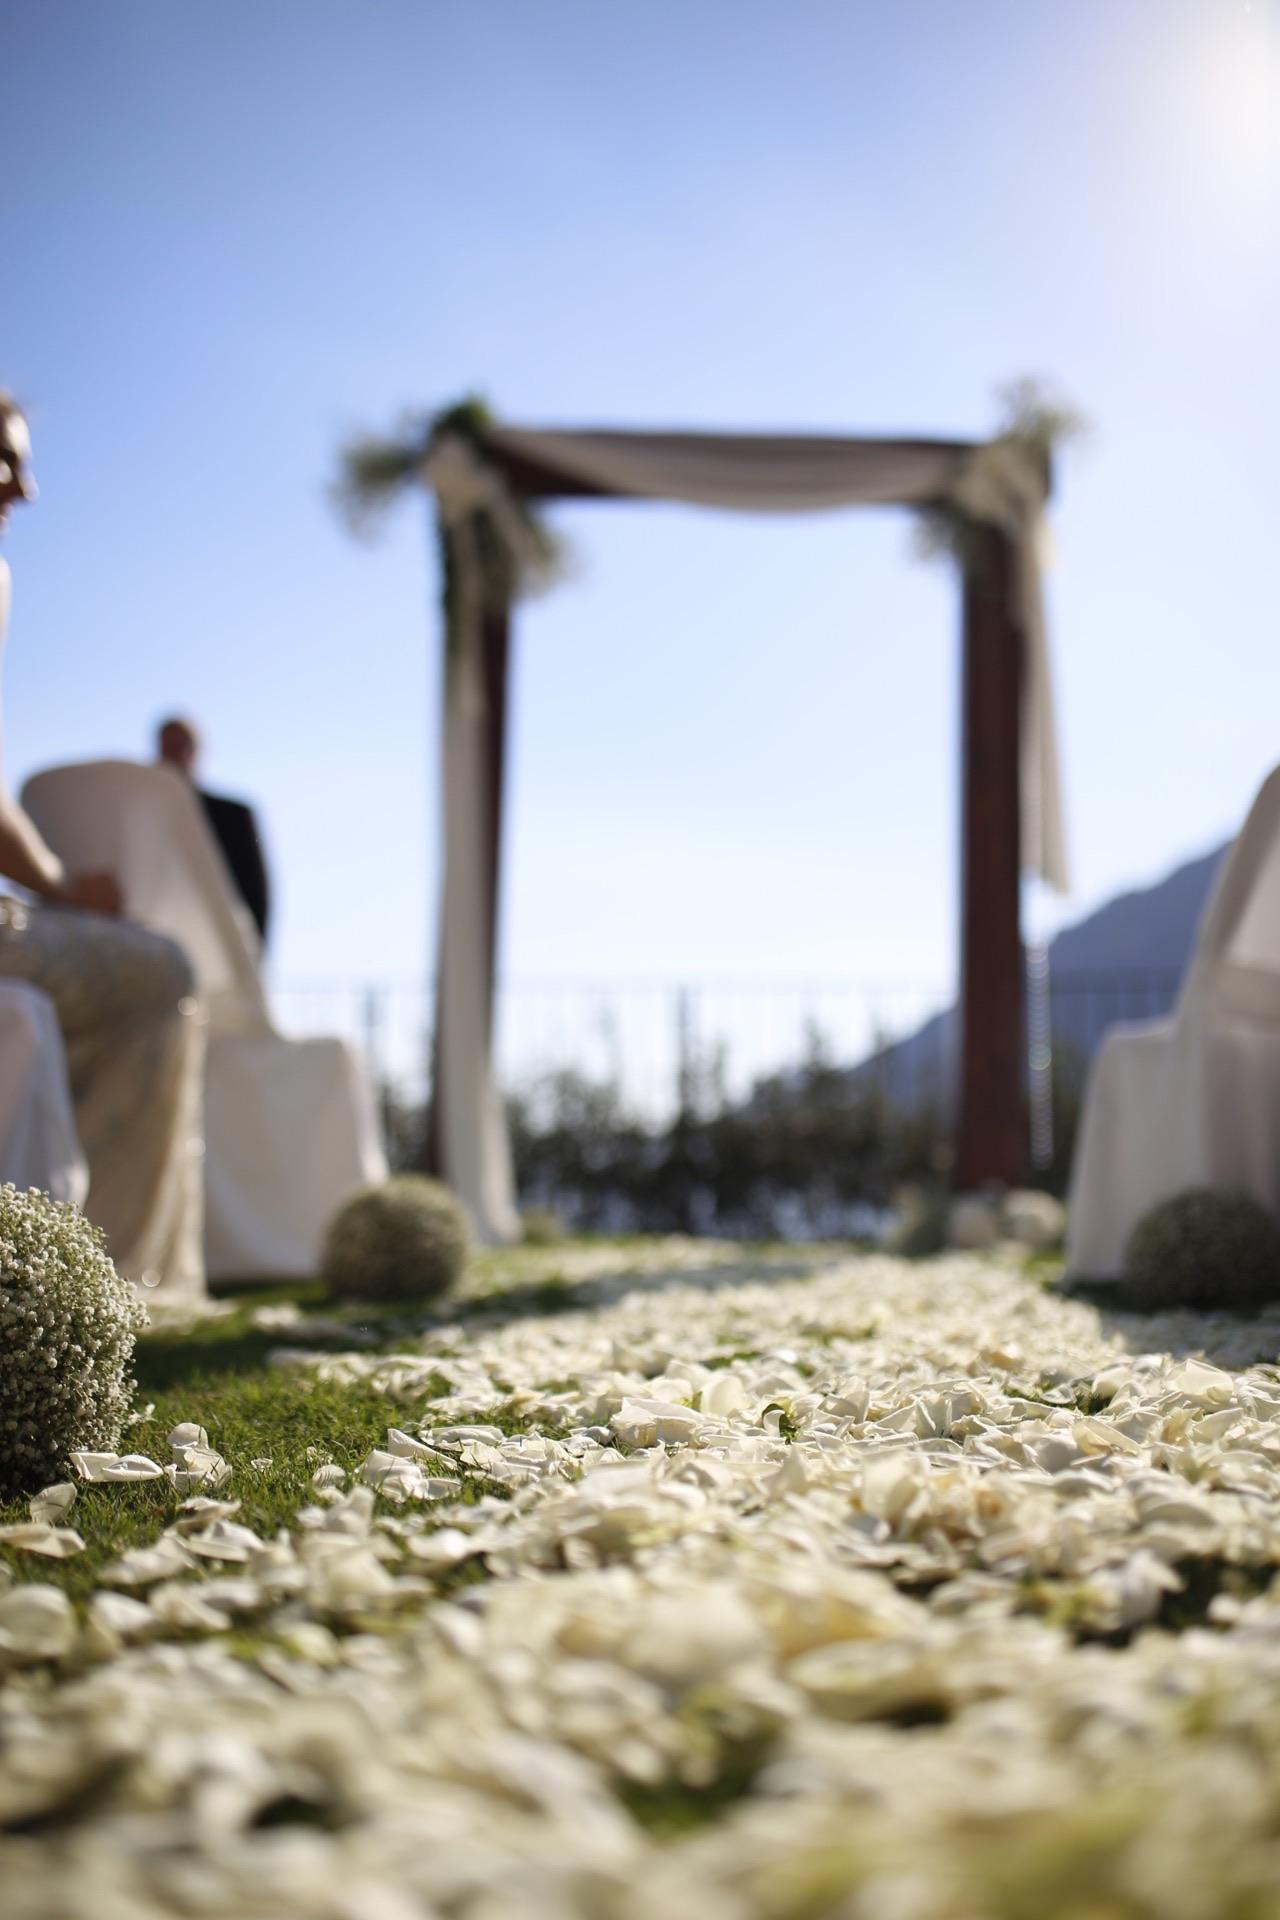 https://www.weddingamalfi.com/wp-content/uploads/Nathalie-and-Benjamin-Wedding-in-Positano-Italy-21.jpg